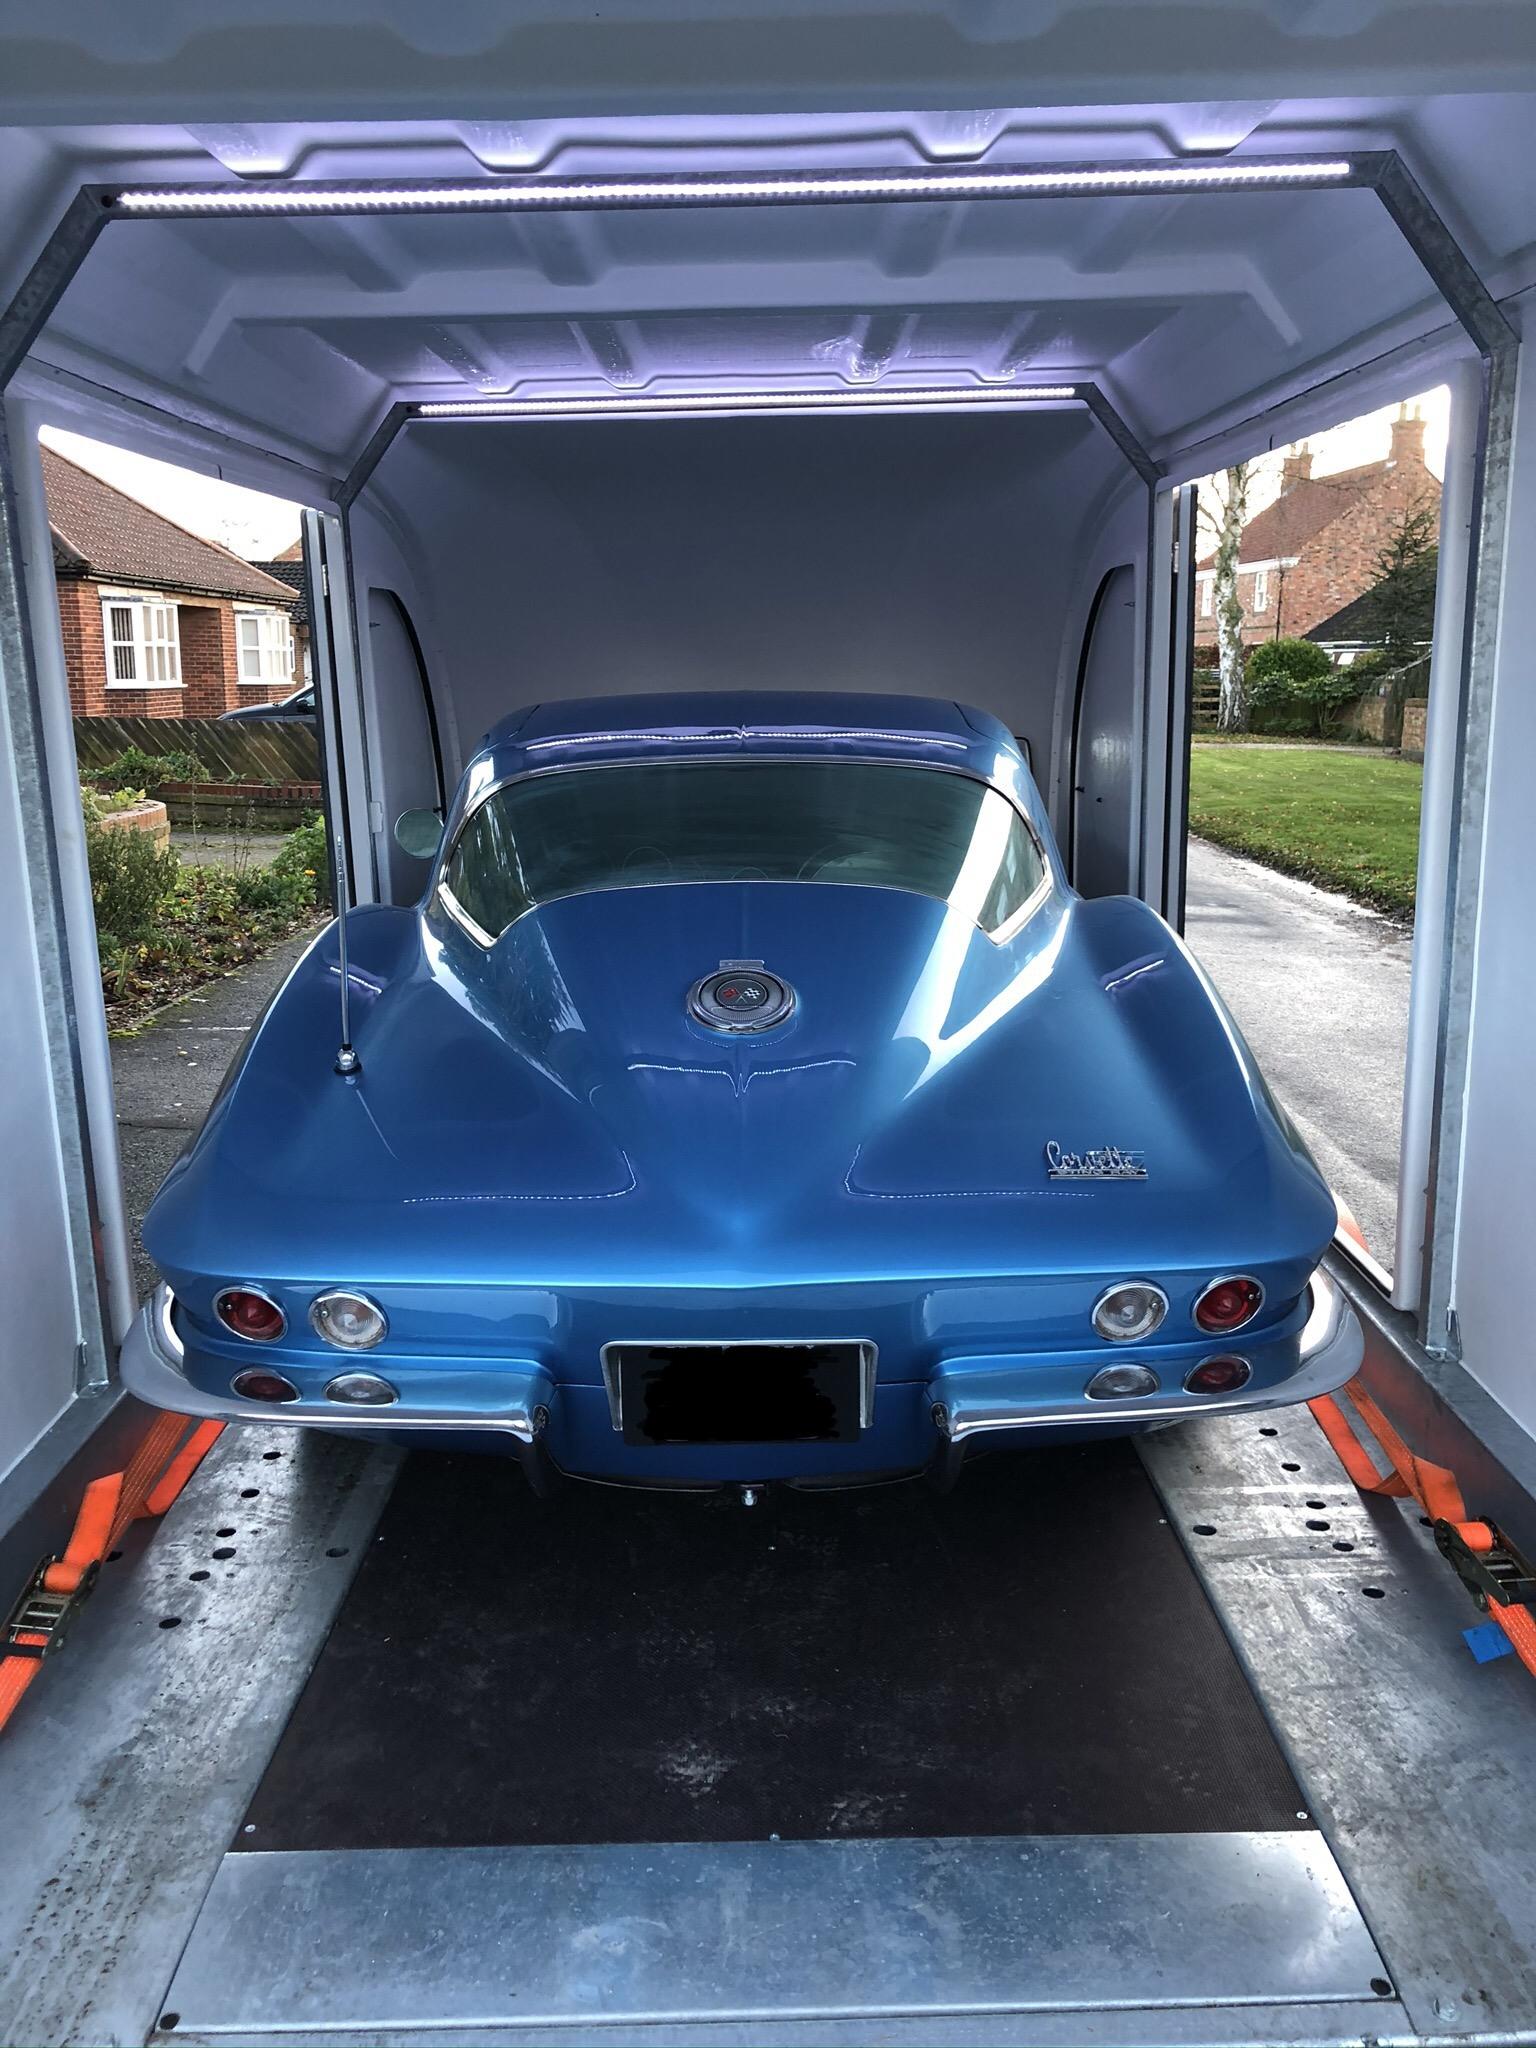 Corvette Stingray enclosed car delivery